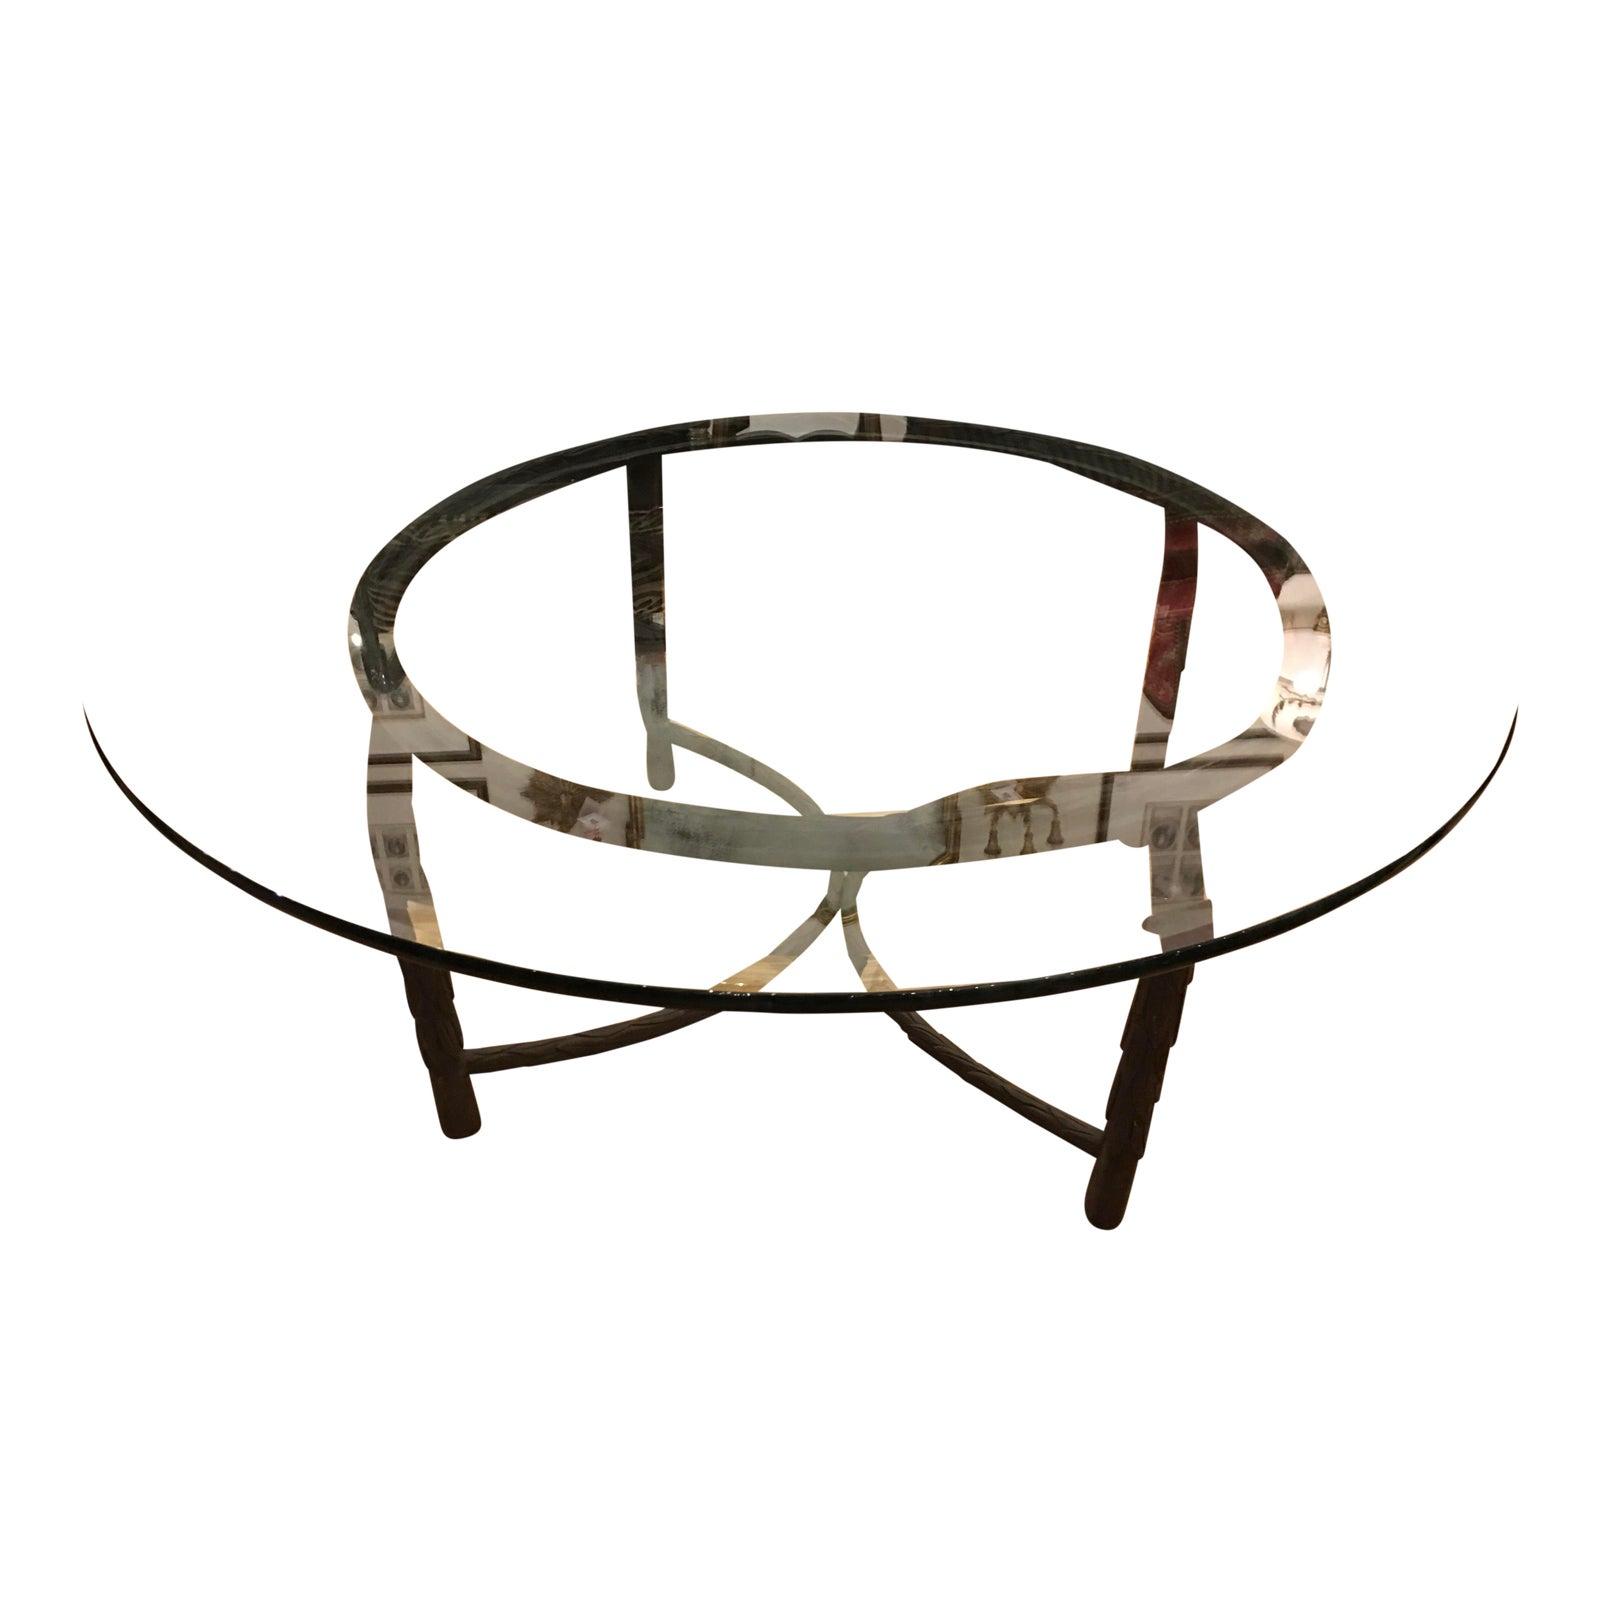 Round modern designer wrought iron coffee table chairish